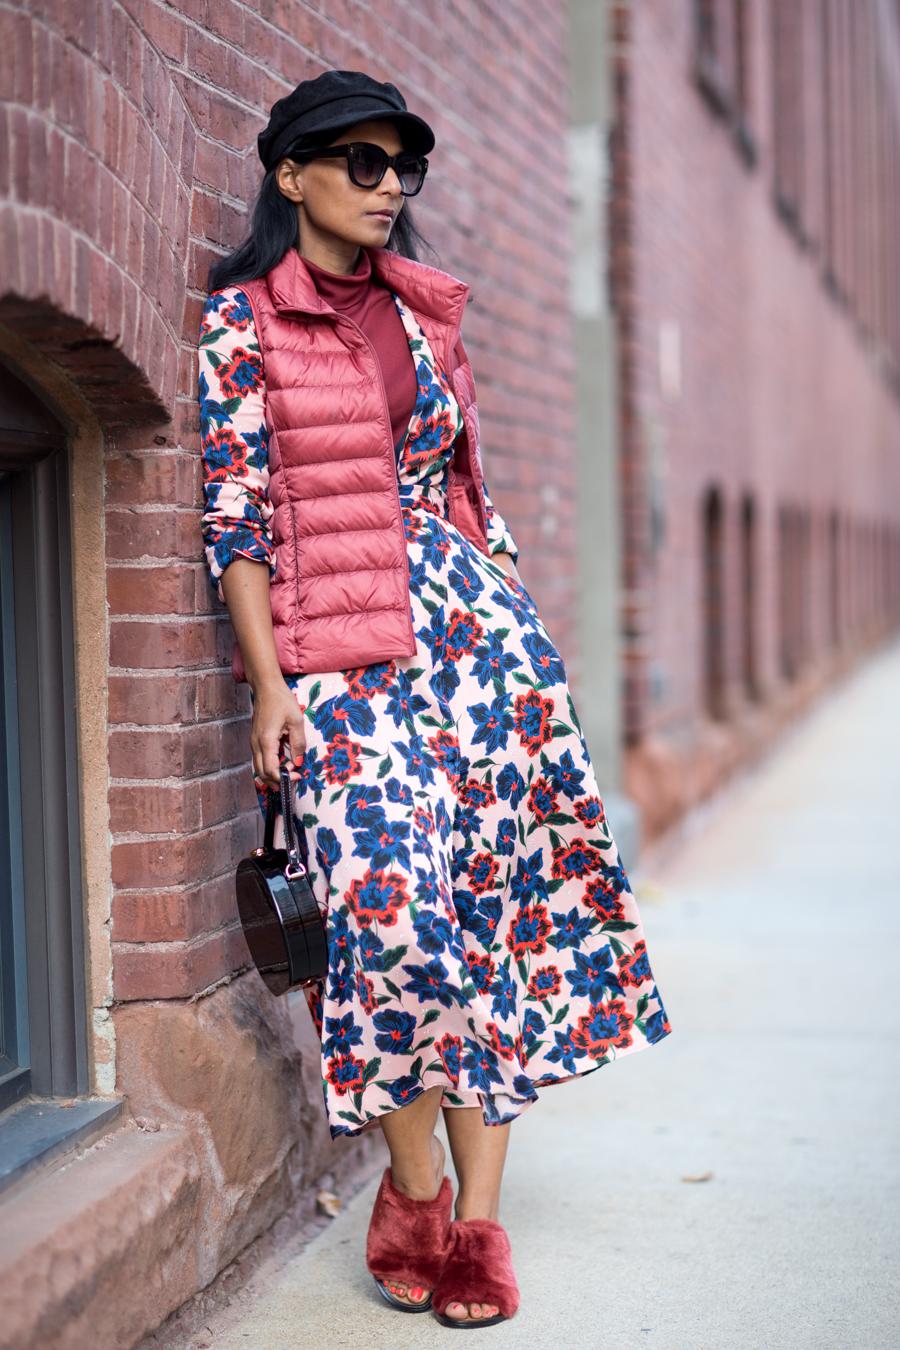 florals, fall fashion, down vest, fall layers, art of layering, faux fux, mules, circle bag, zara, uniqlo, fall style trends, petite fashion, boston style, petite blogger, feminine style, european style